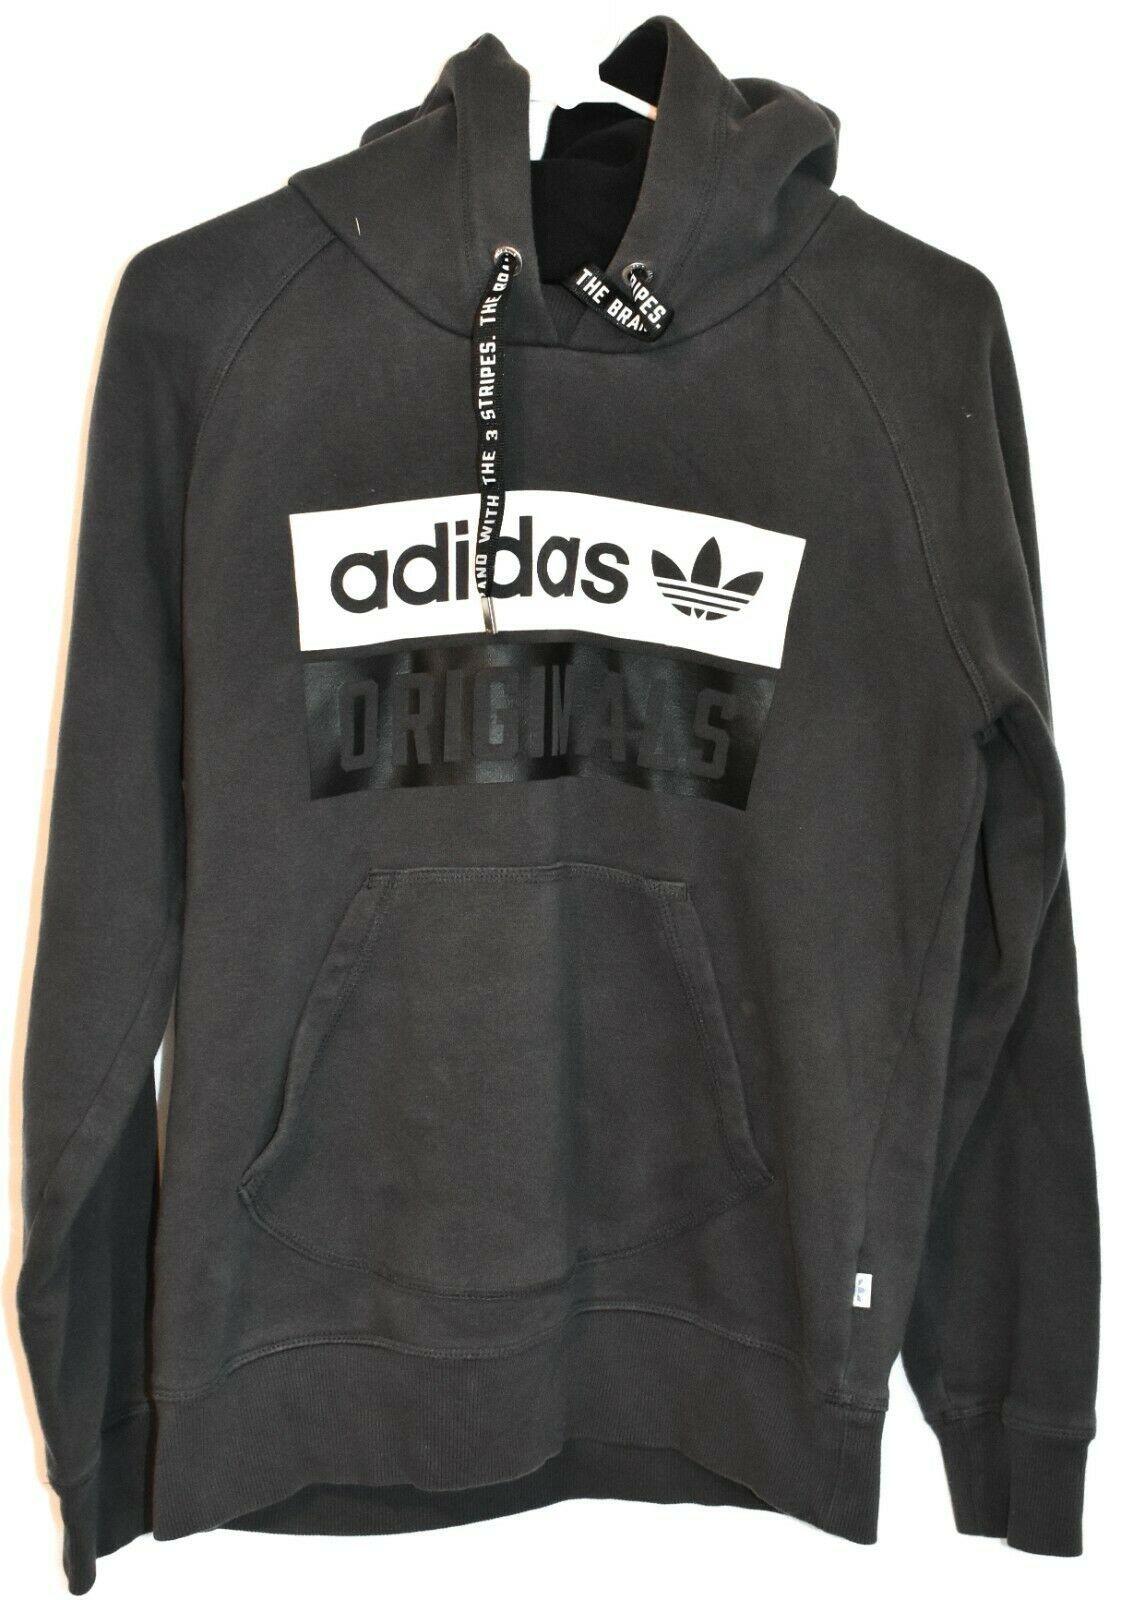 adidas Originals Women's Dark Gray Logo Graphic Hooded Hoodie Sweatshirt Size M